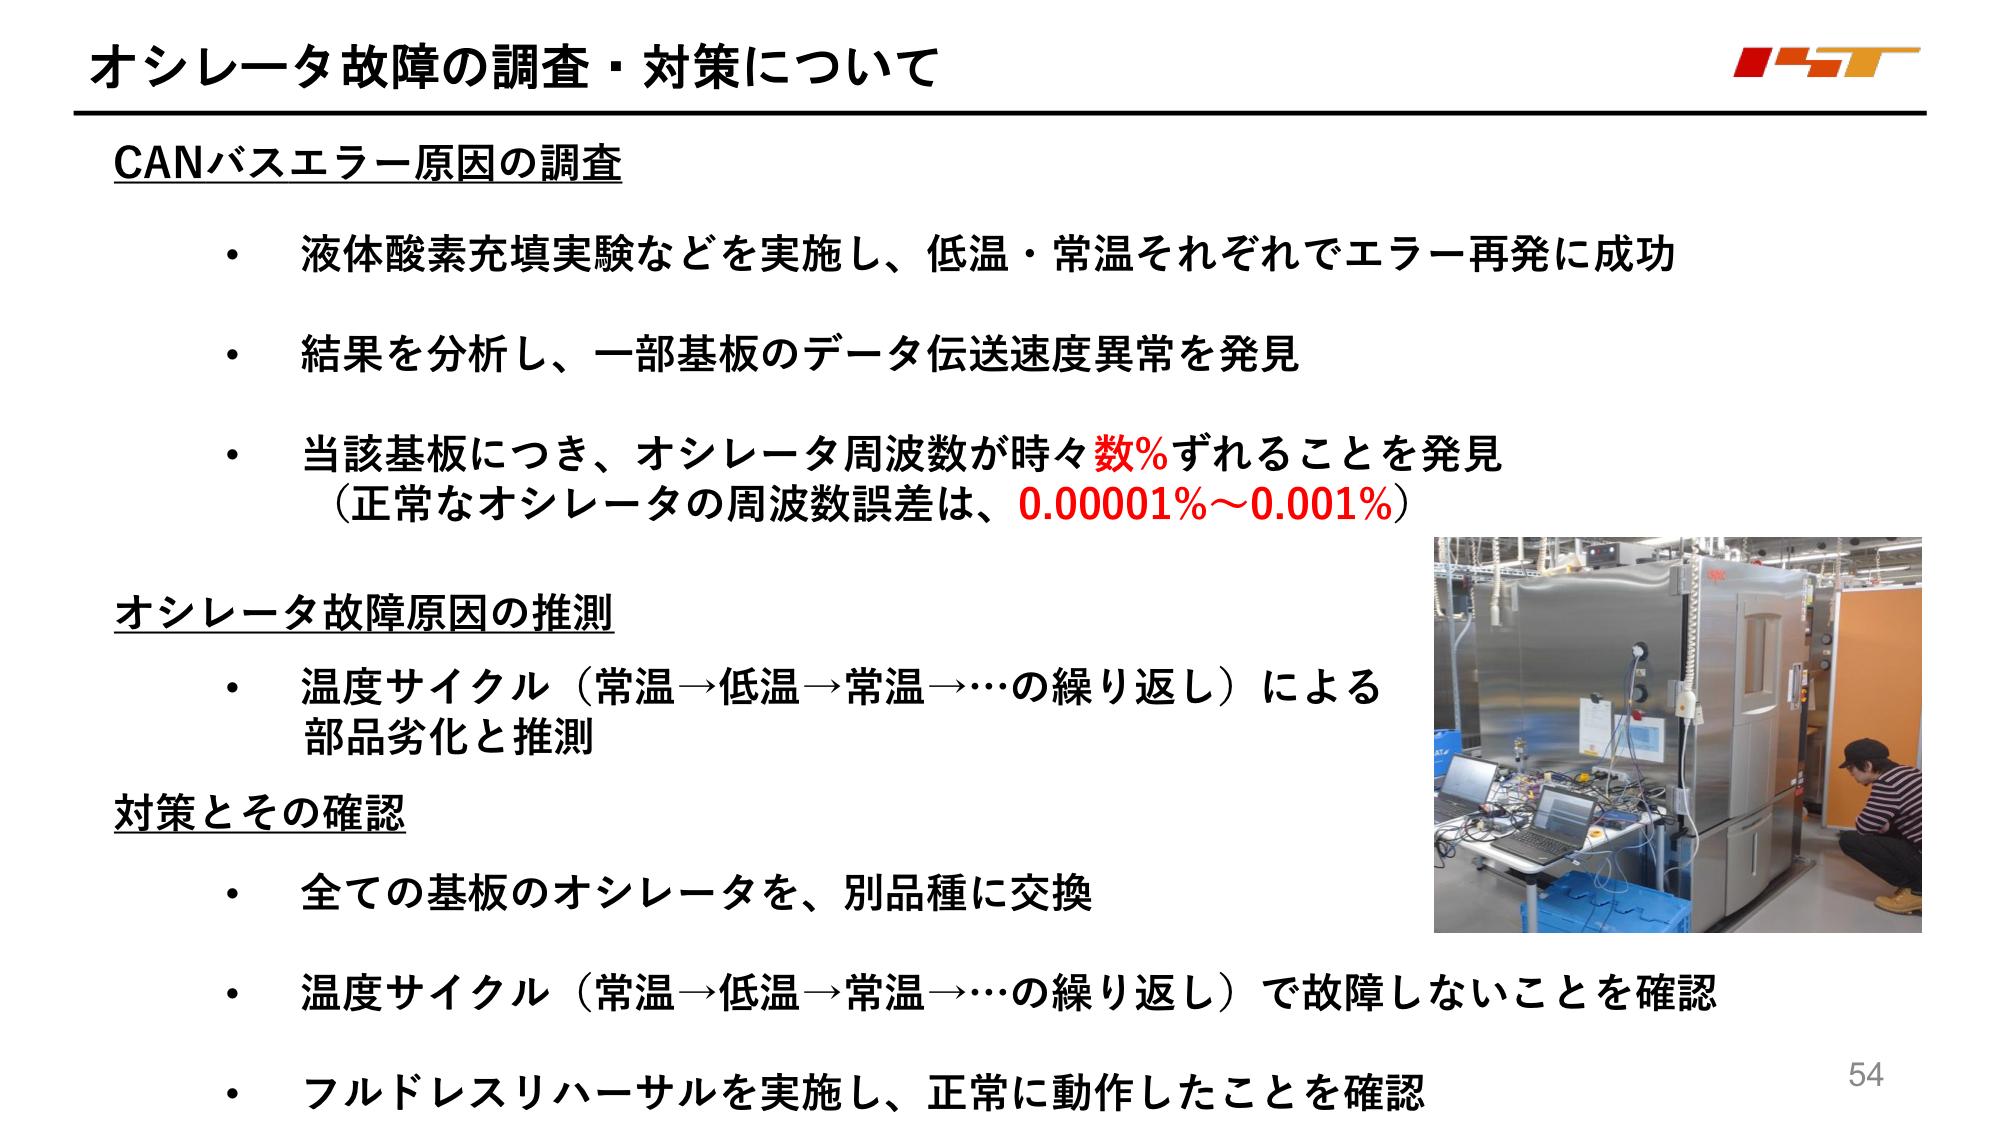 f:id:Imamura:20200603233309p:plain